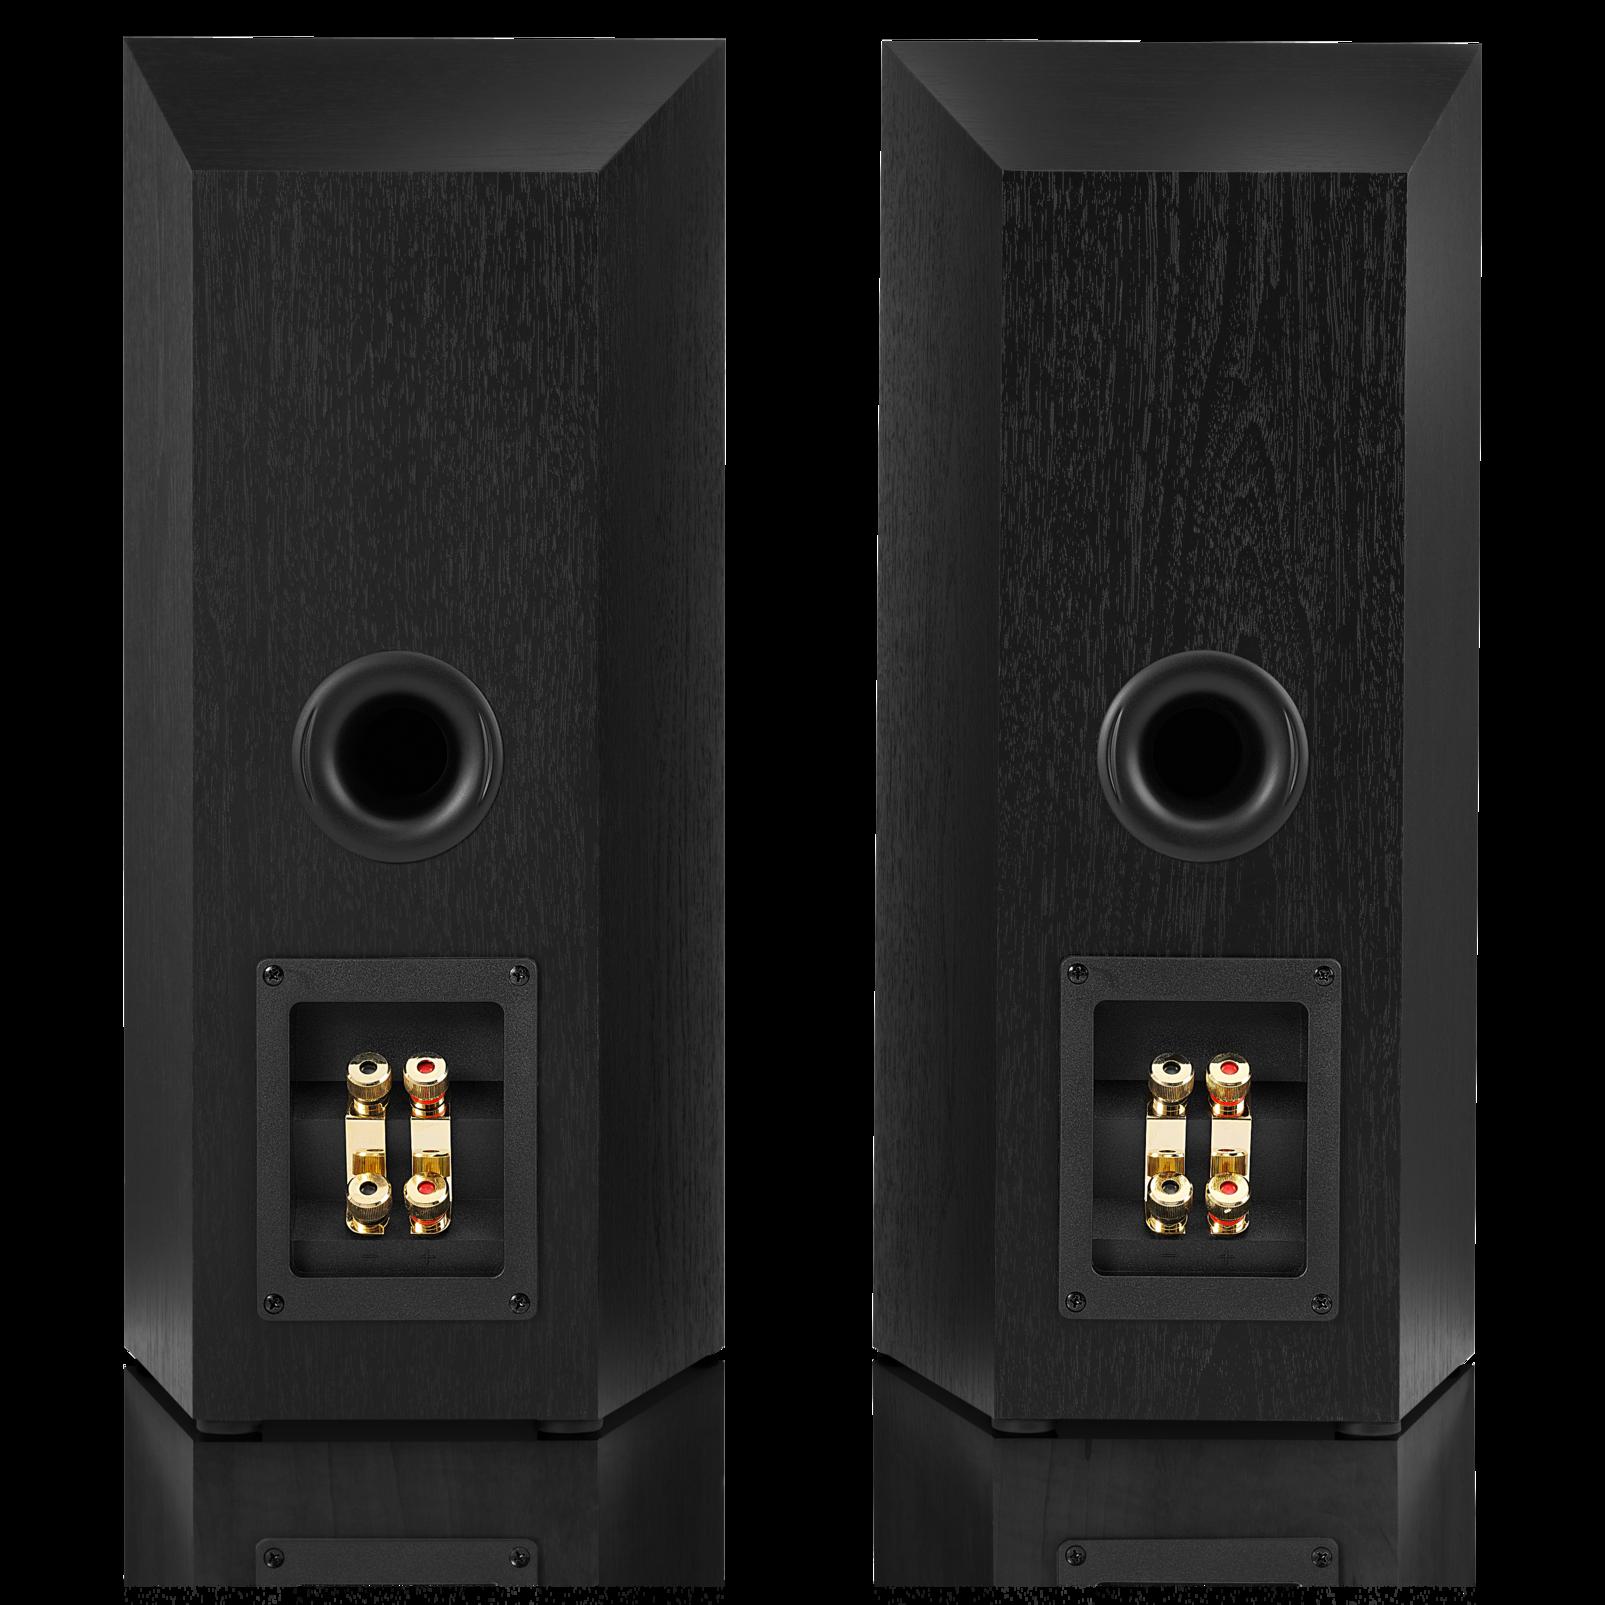 Jbl Home Speakers >> Studio 530 Professional Quality 125 Watt Bookshelf Speakers